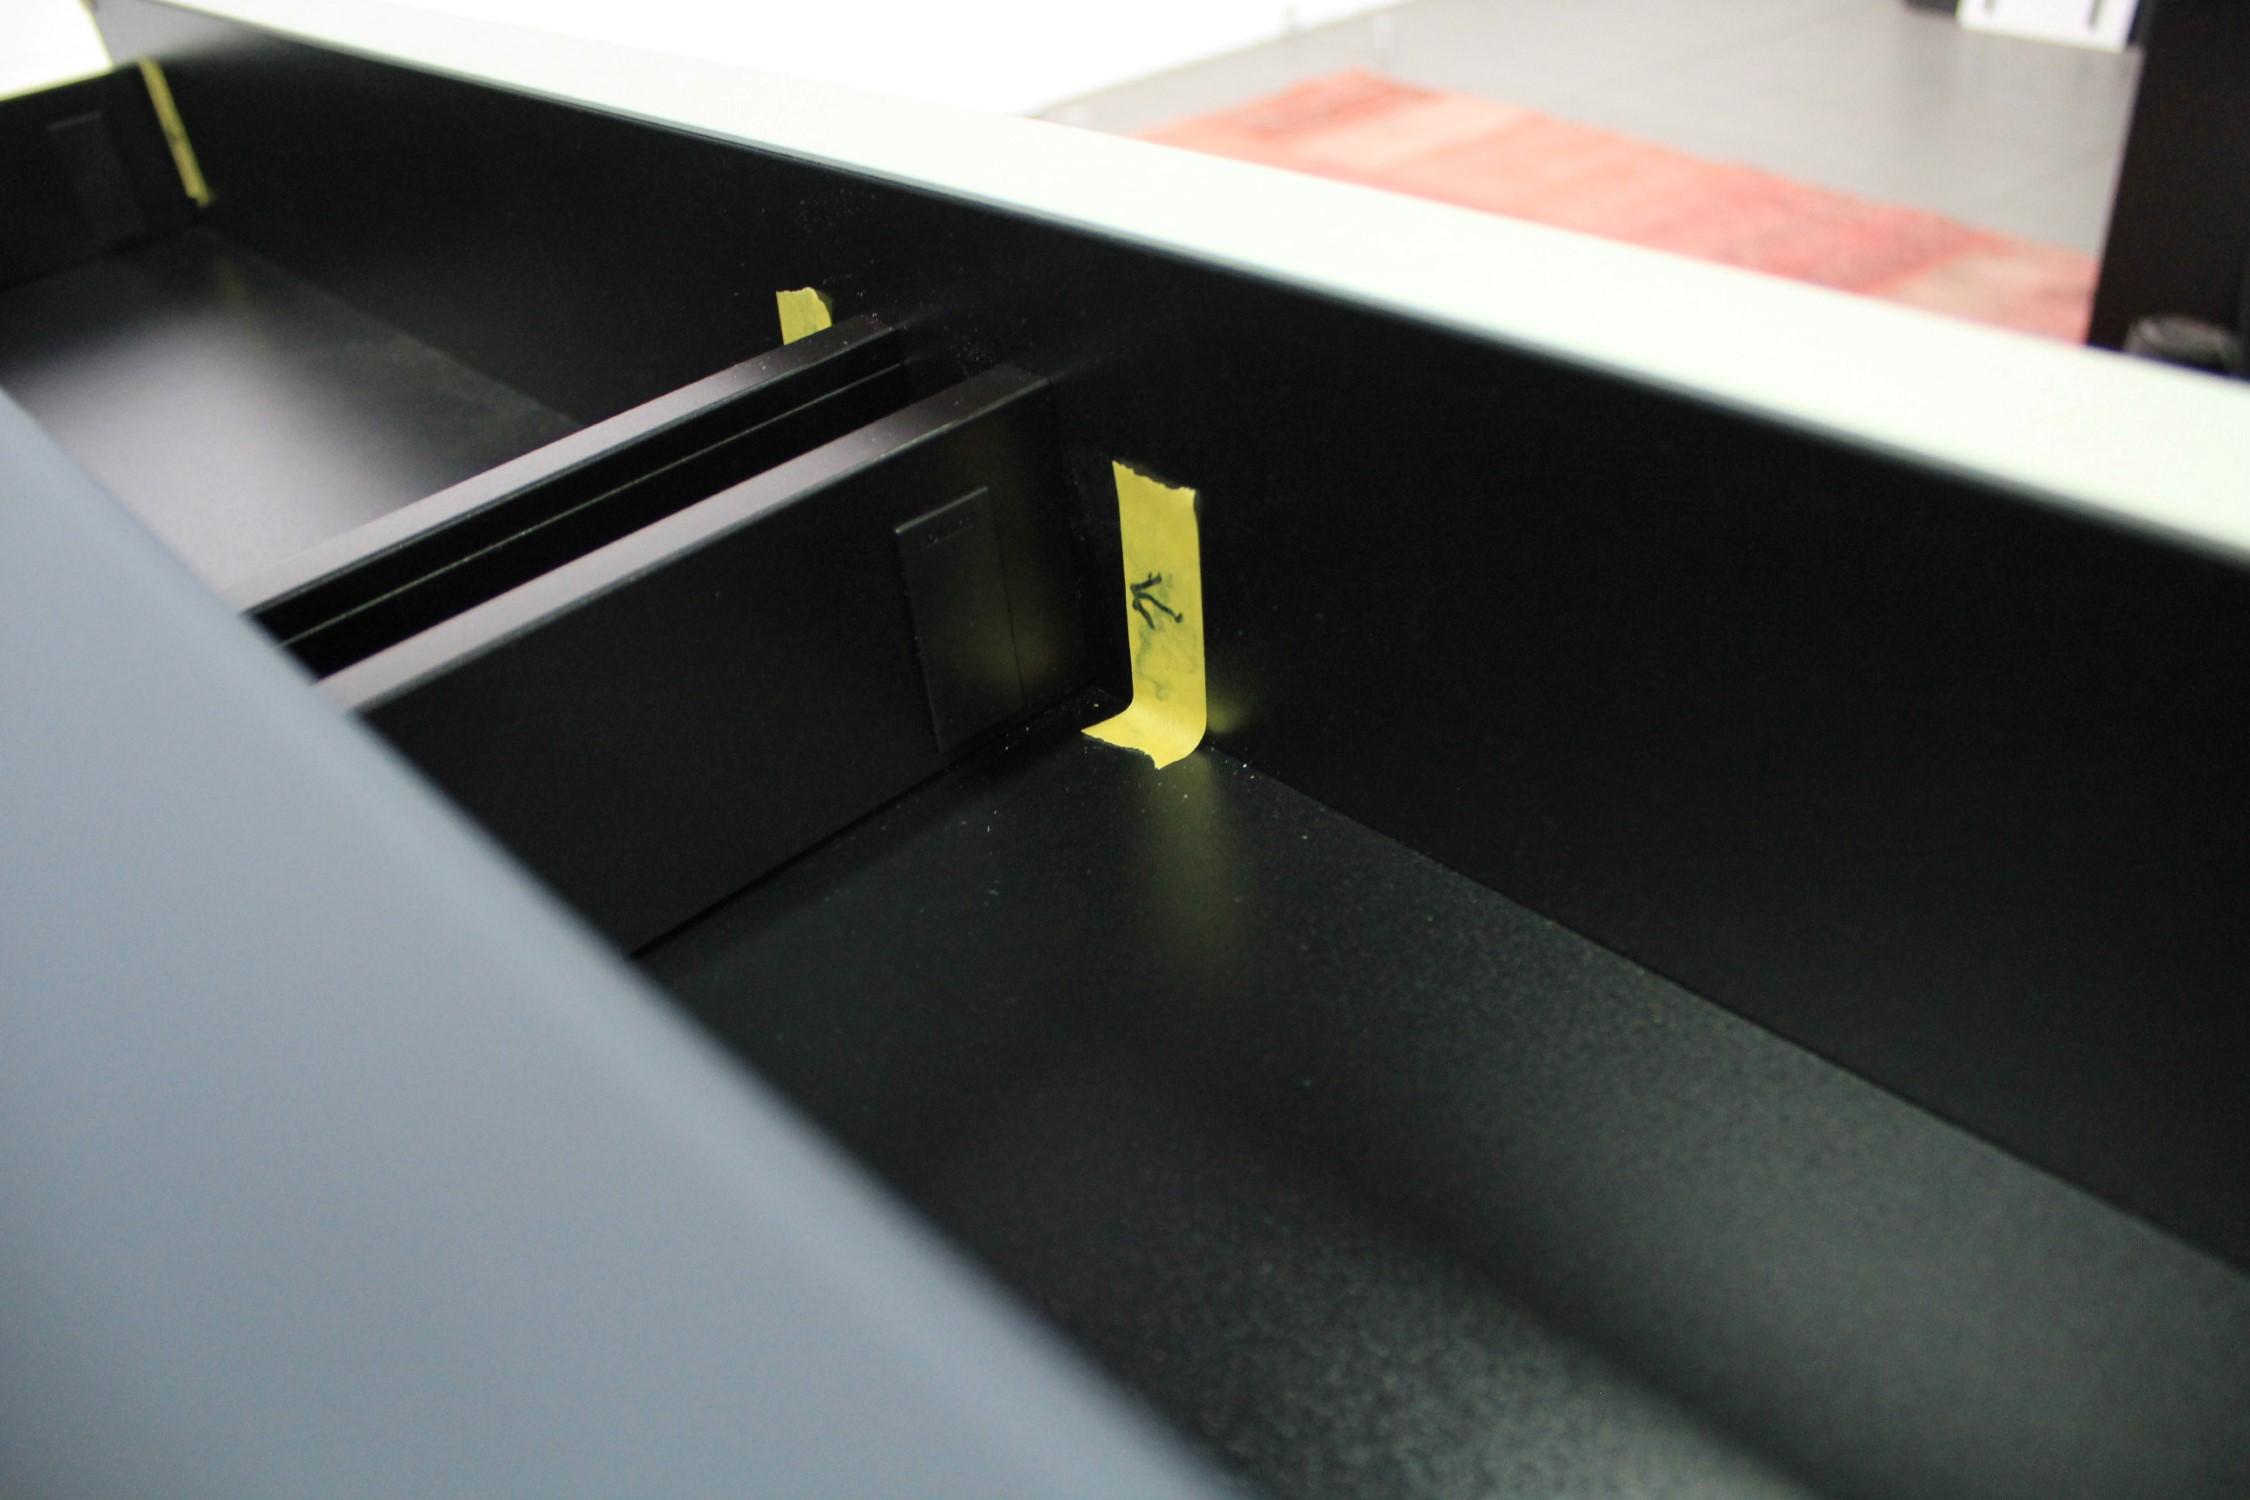 SC1656-NB Komibantion für Soundbar Integration